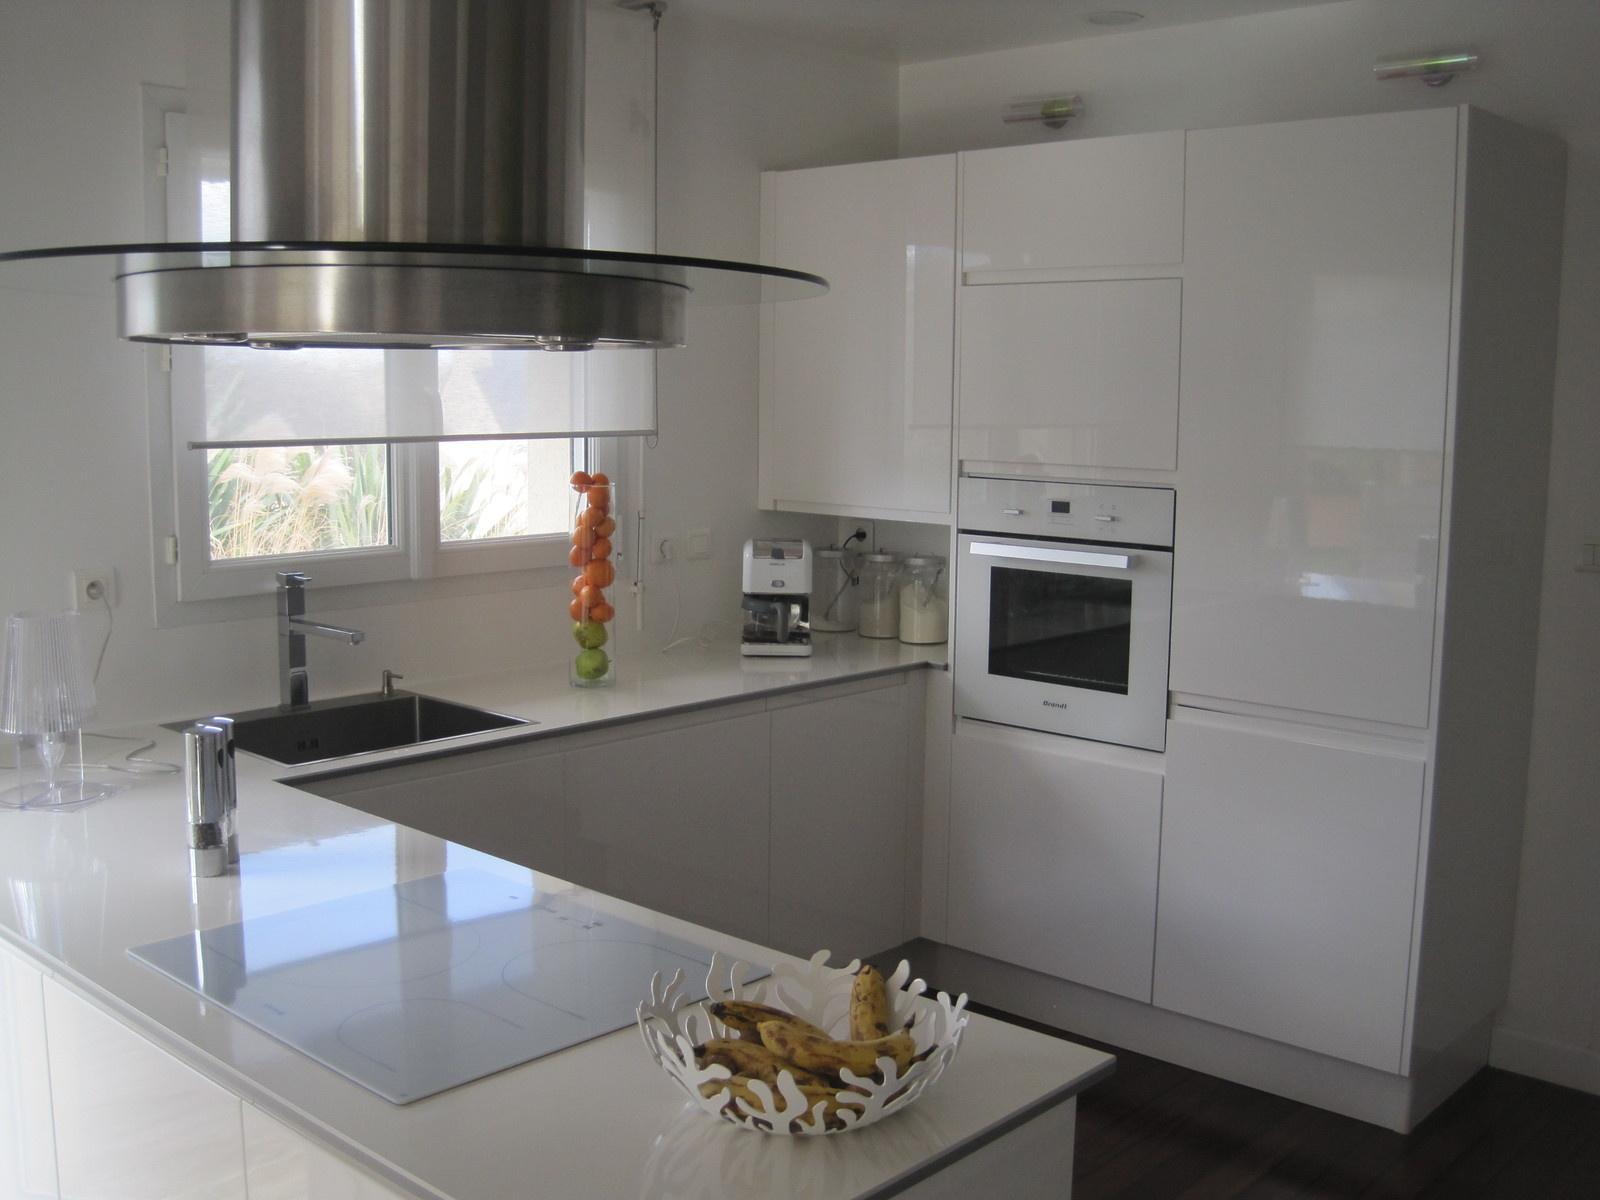 Cuisine 6m2 top cuisine - Exemple de cuisine en u ...